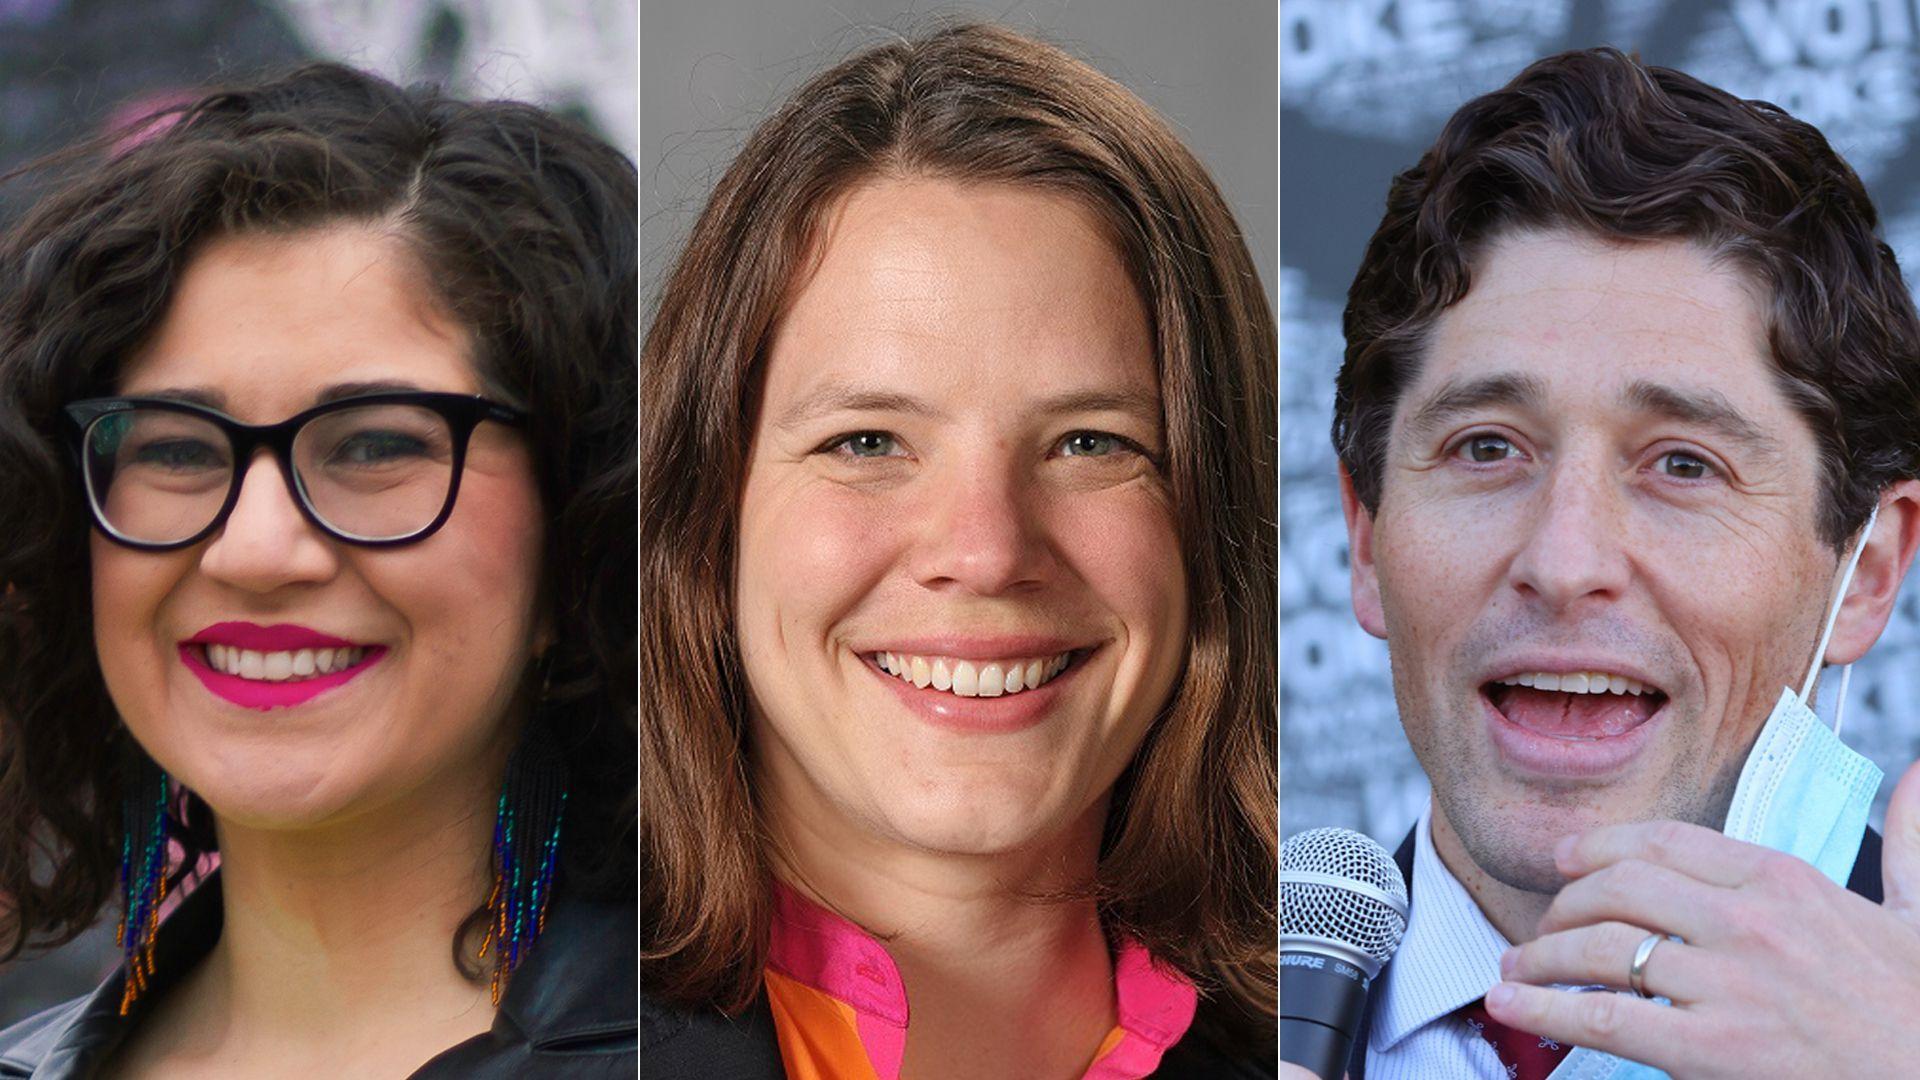 Three headshots of Minneapolis mayoral candidates Sheila Nezhad (left) and Kate Knuth (middle), alongside incumbent Jacob Frey (right).